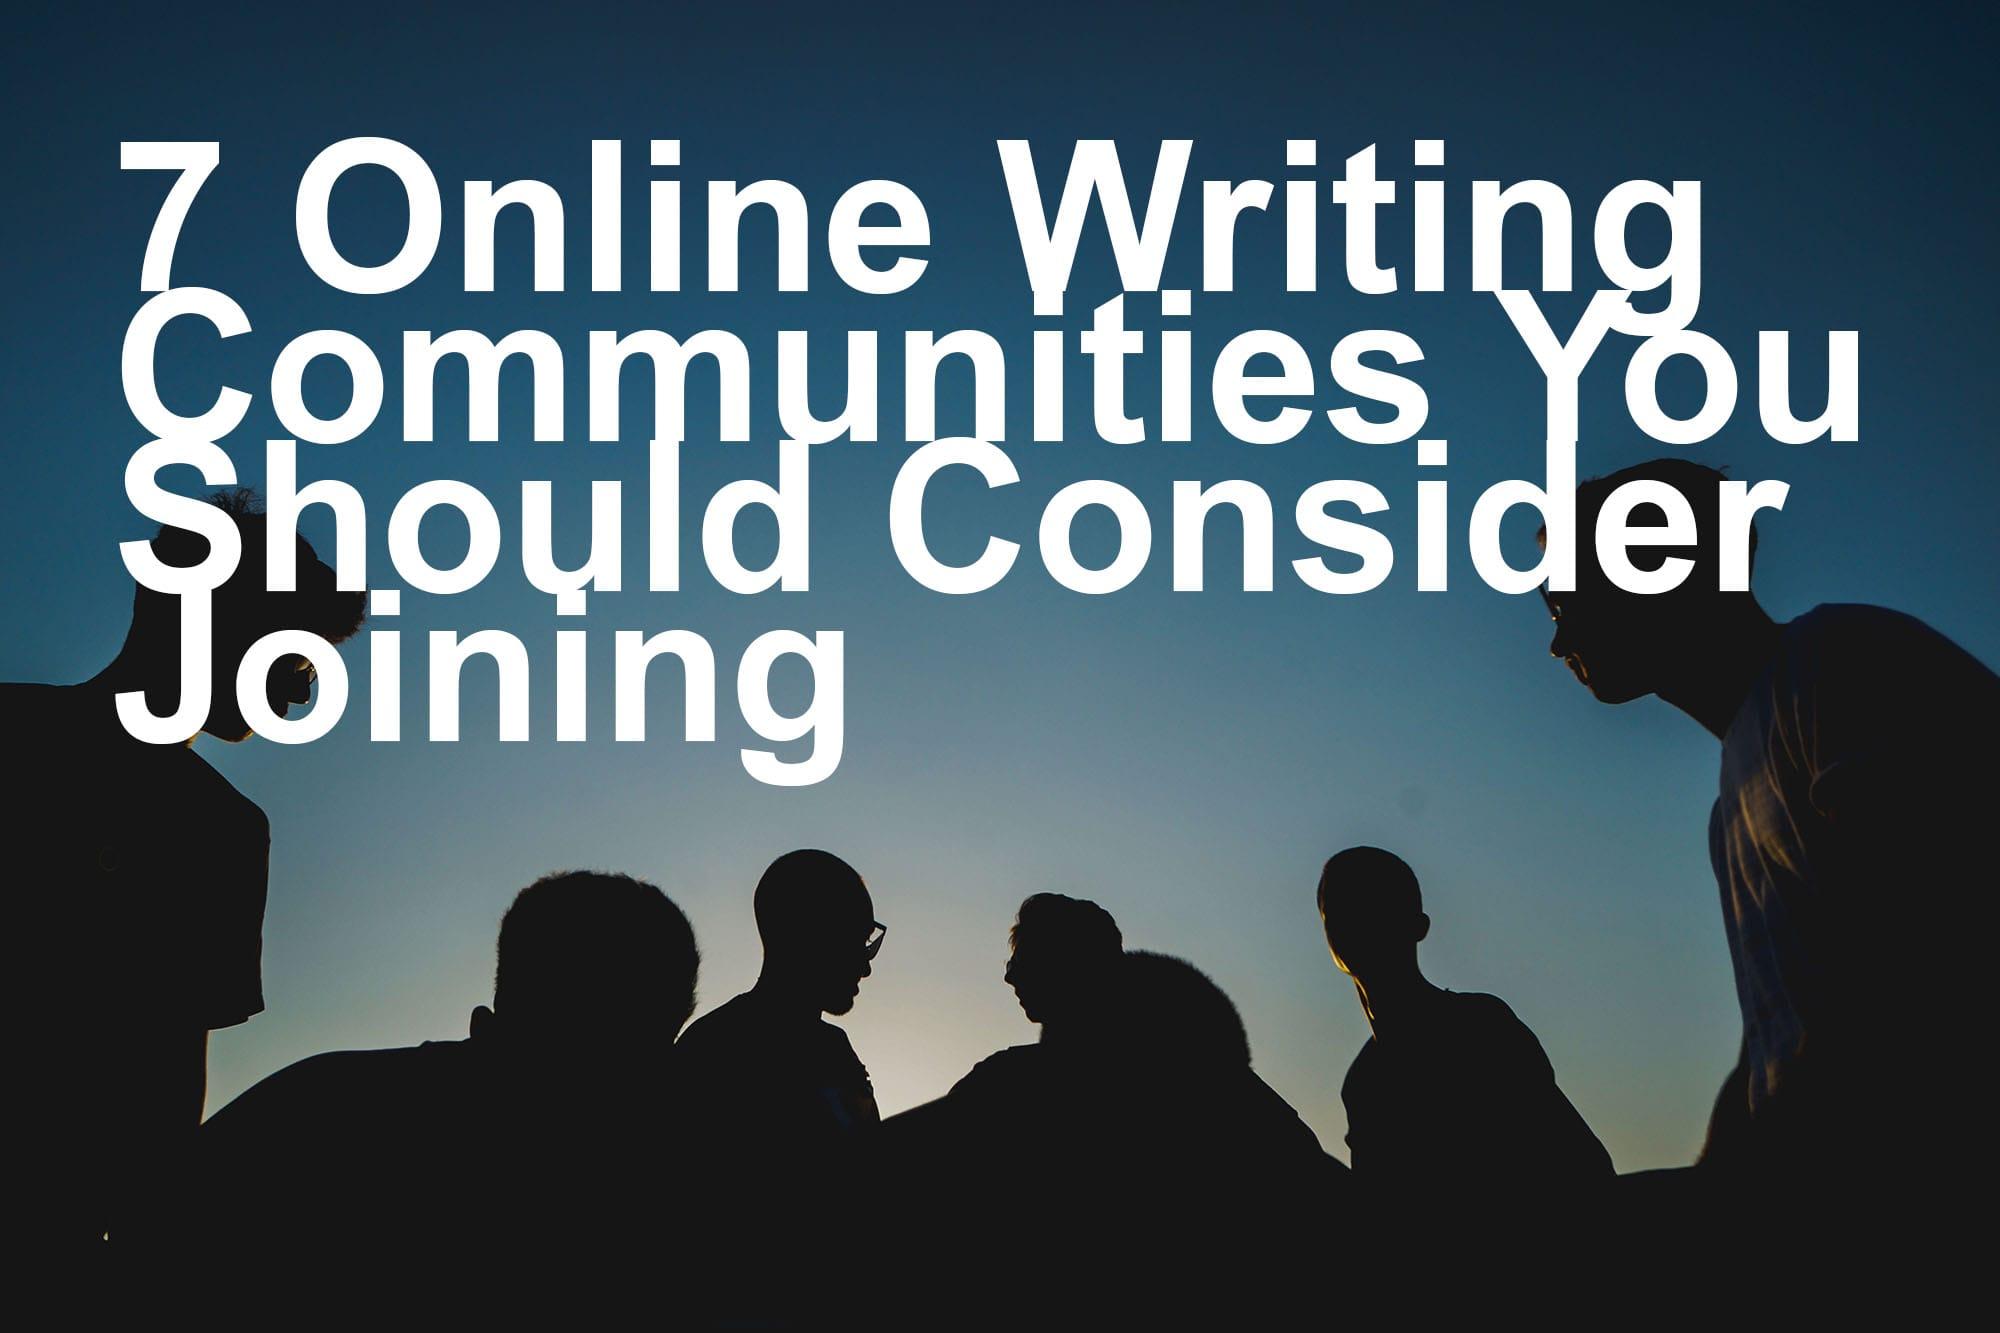 online writing communities